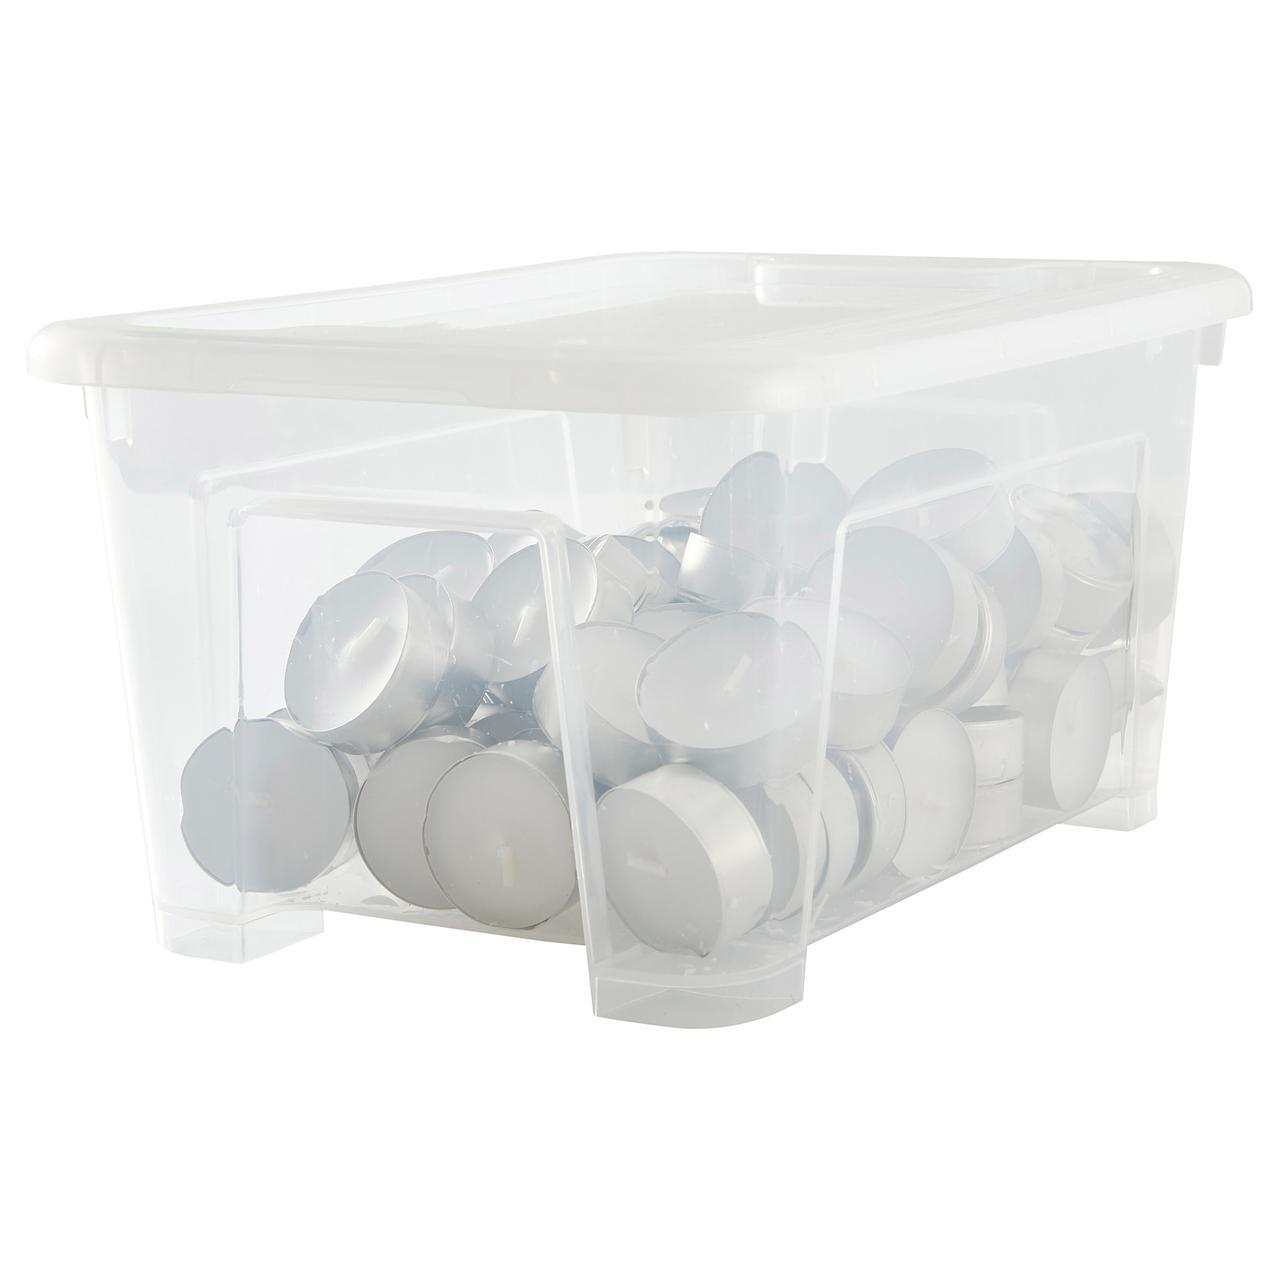 IKEA SAMLA (498.716.76) Коробка с крышкой, прозрачная